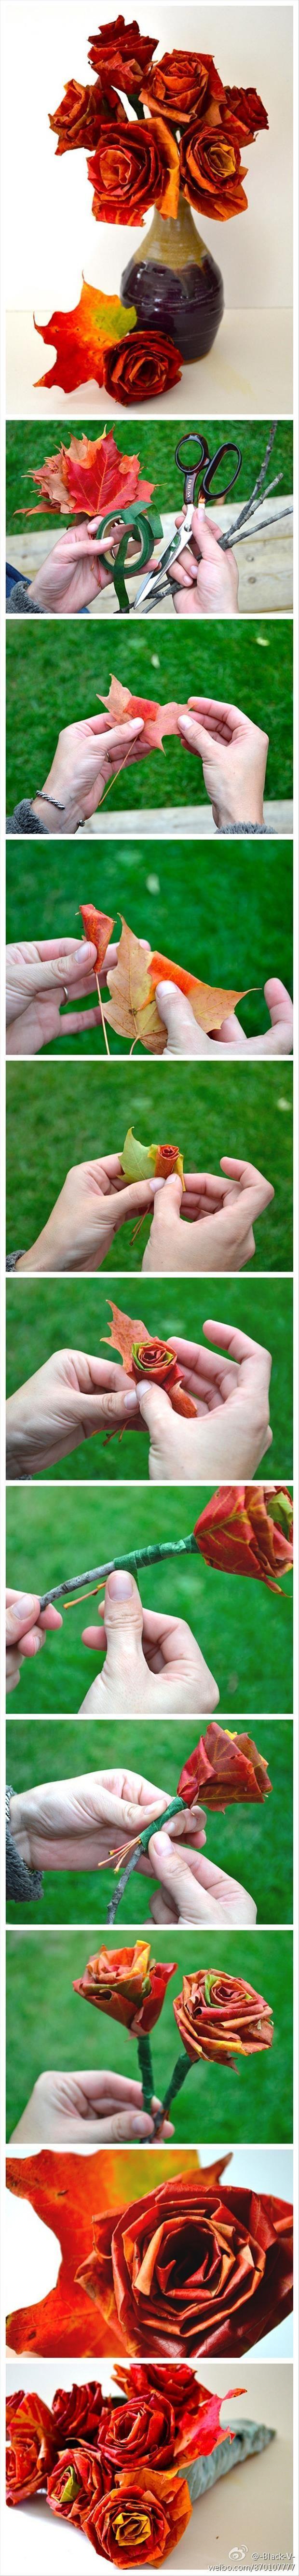 DIY leaf roses